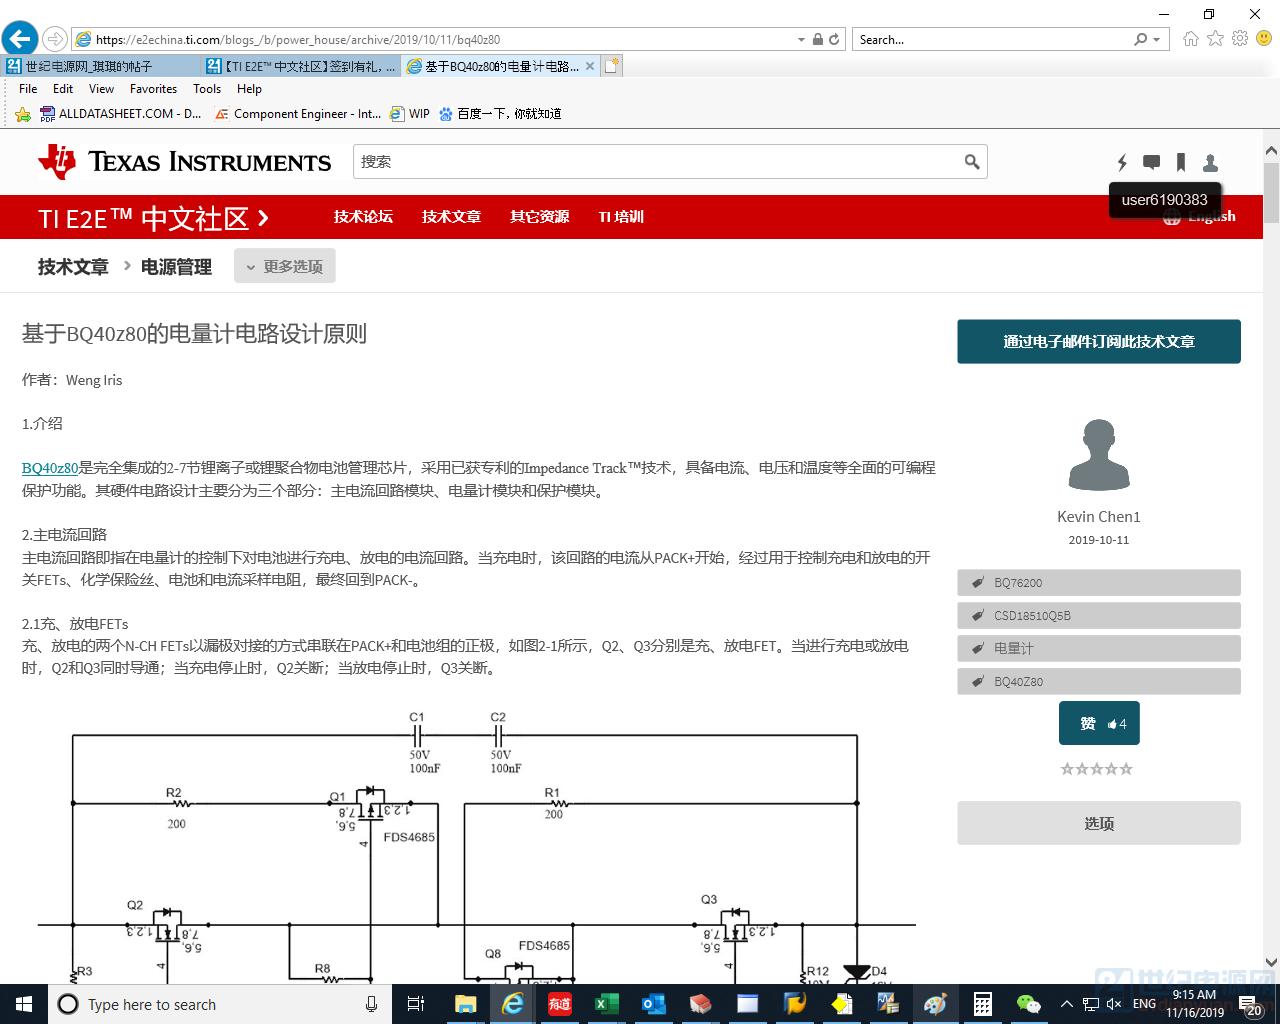 72067A8E-A4B7-4F9E-AB4B-1CEEF489C183.png